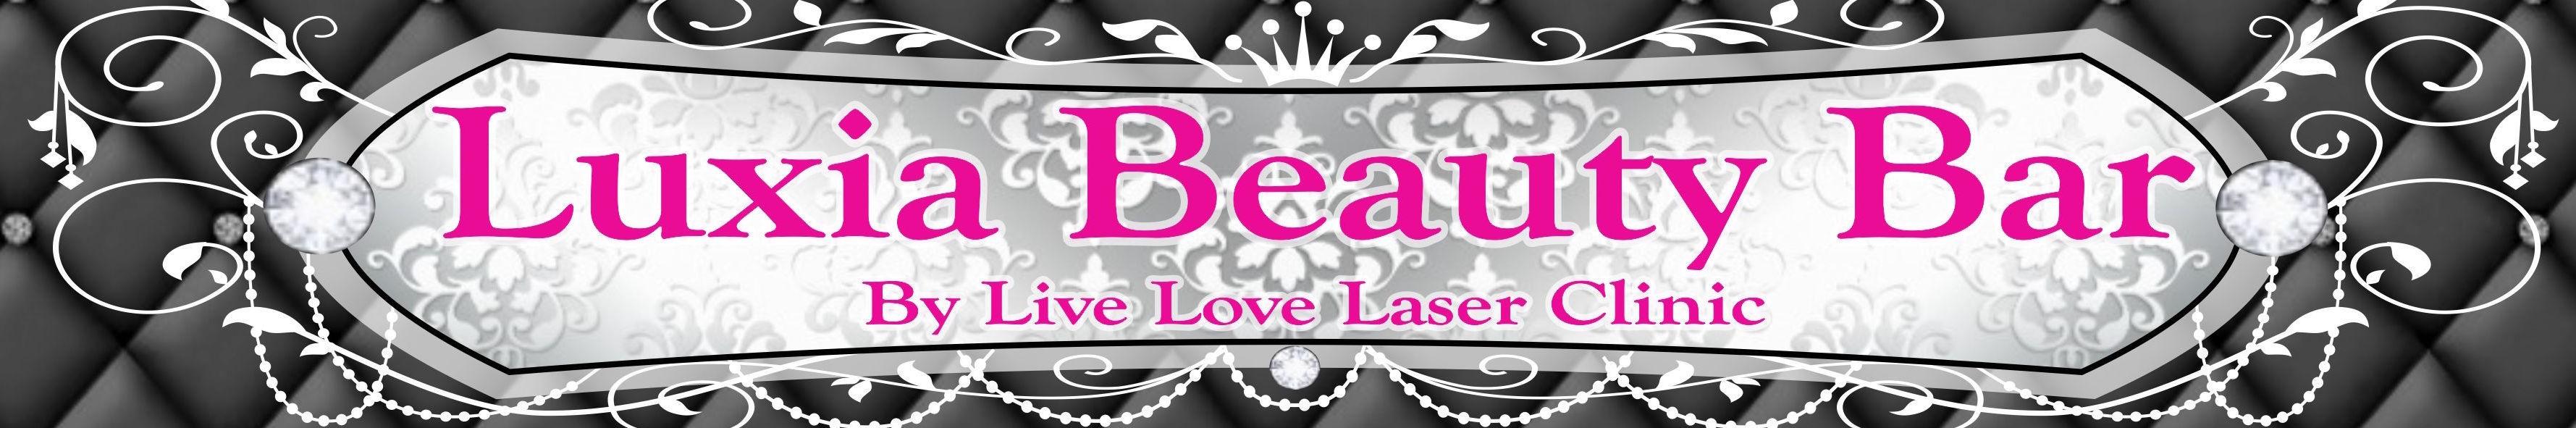 Live Love Laser Clinic logo